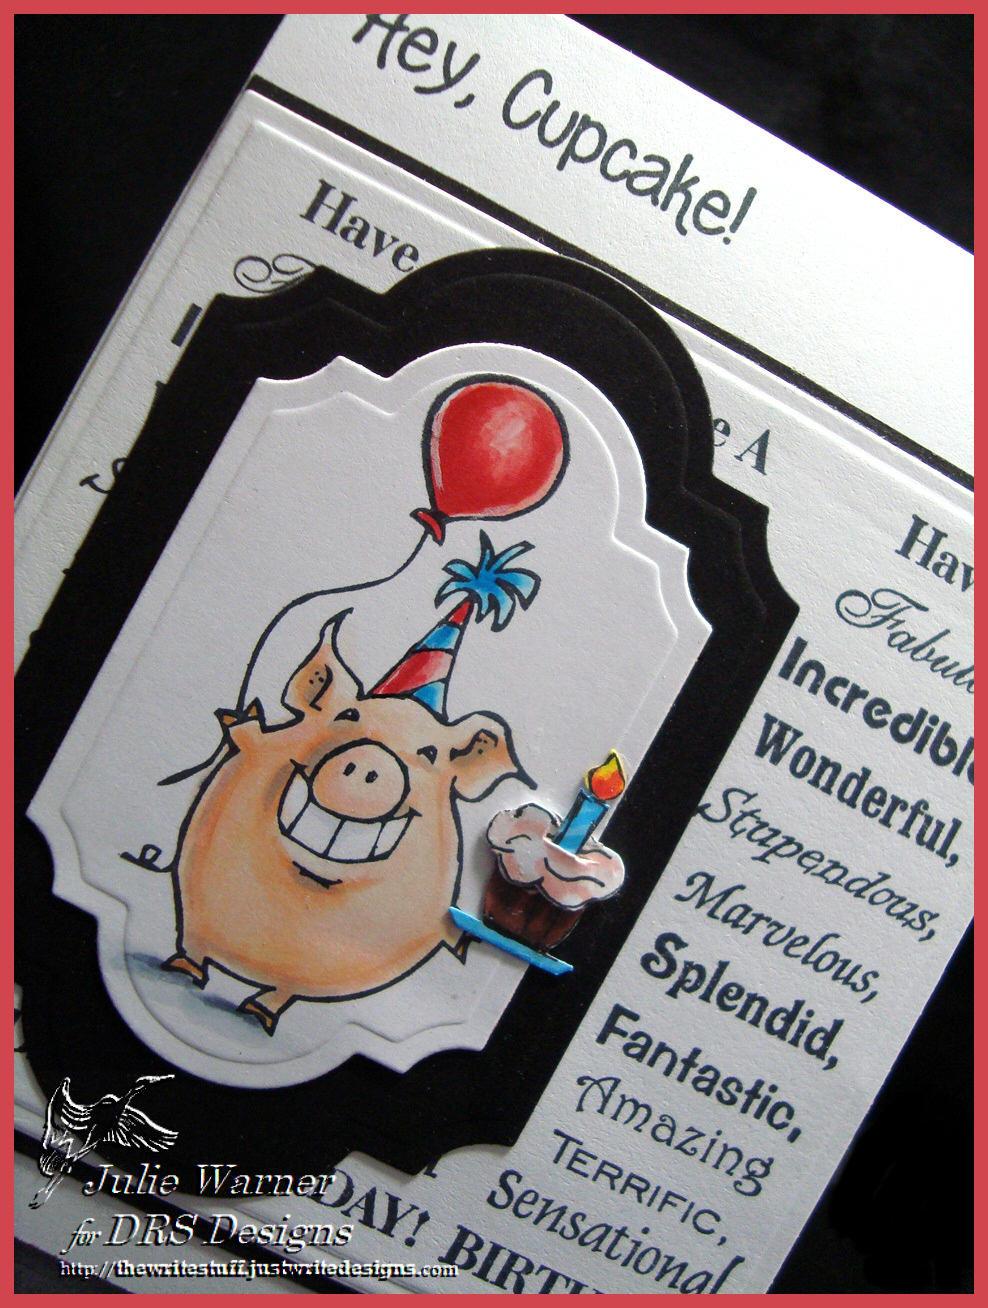 Cupcake Party cu 05885